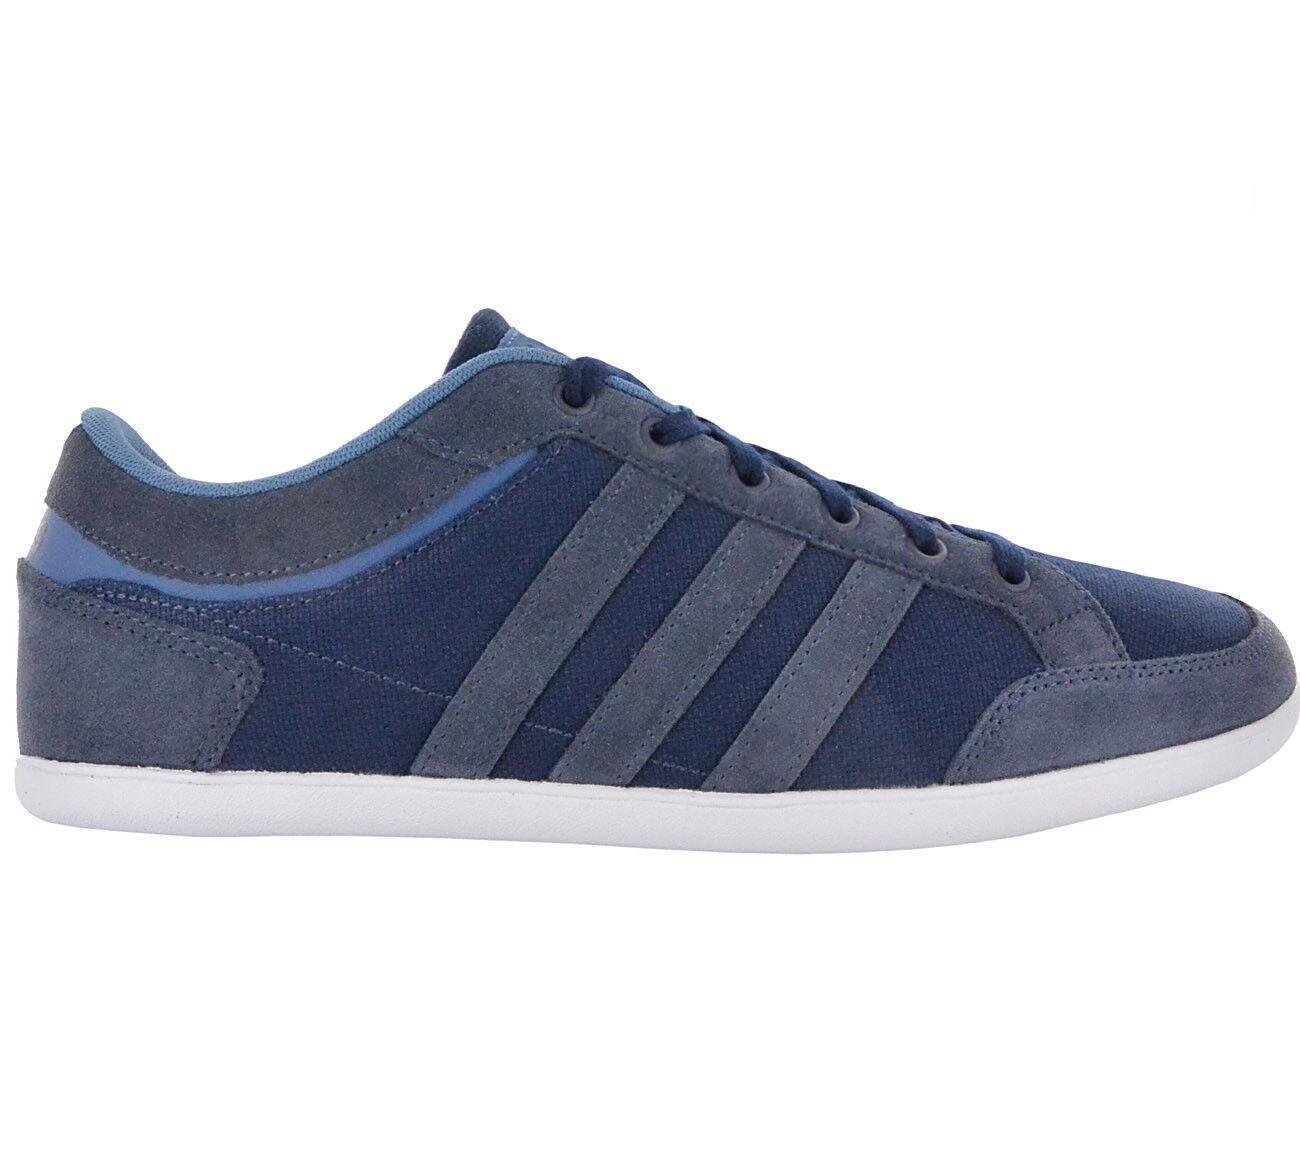 Adidas Men's Sneakers Unwind Originals Shoes Navy Blue Gym Shoe NEW f99364